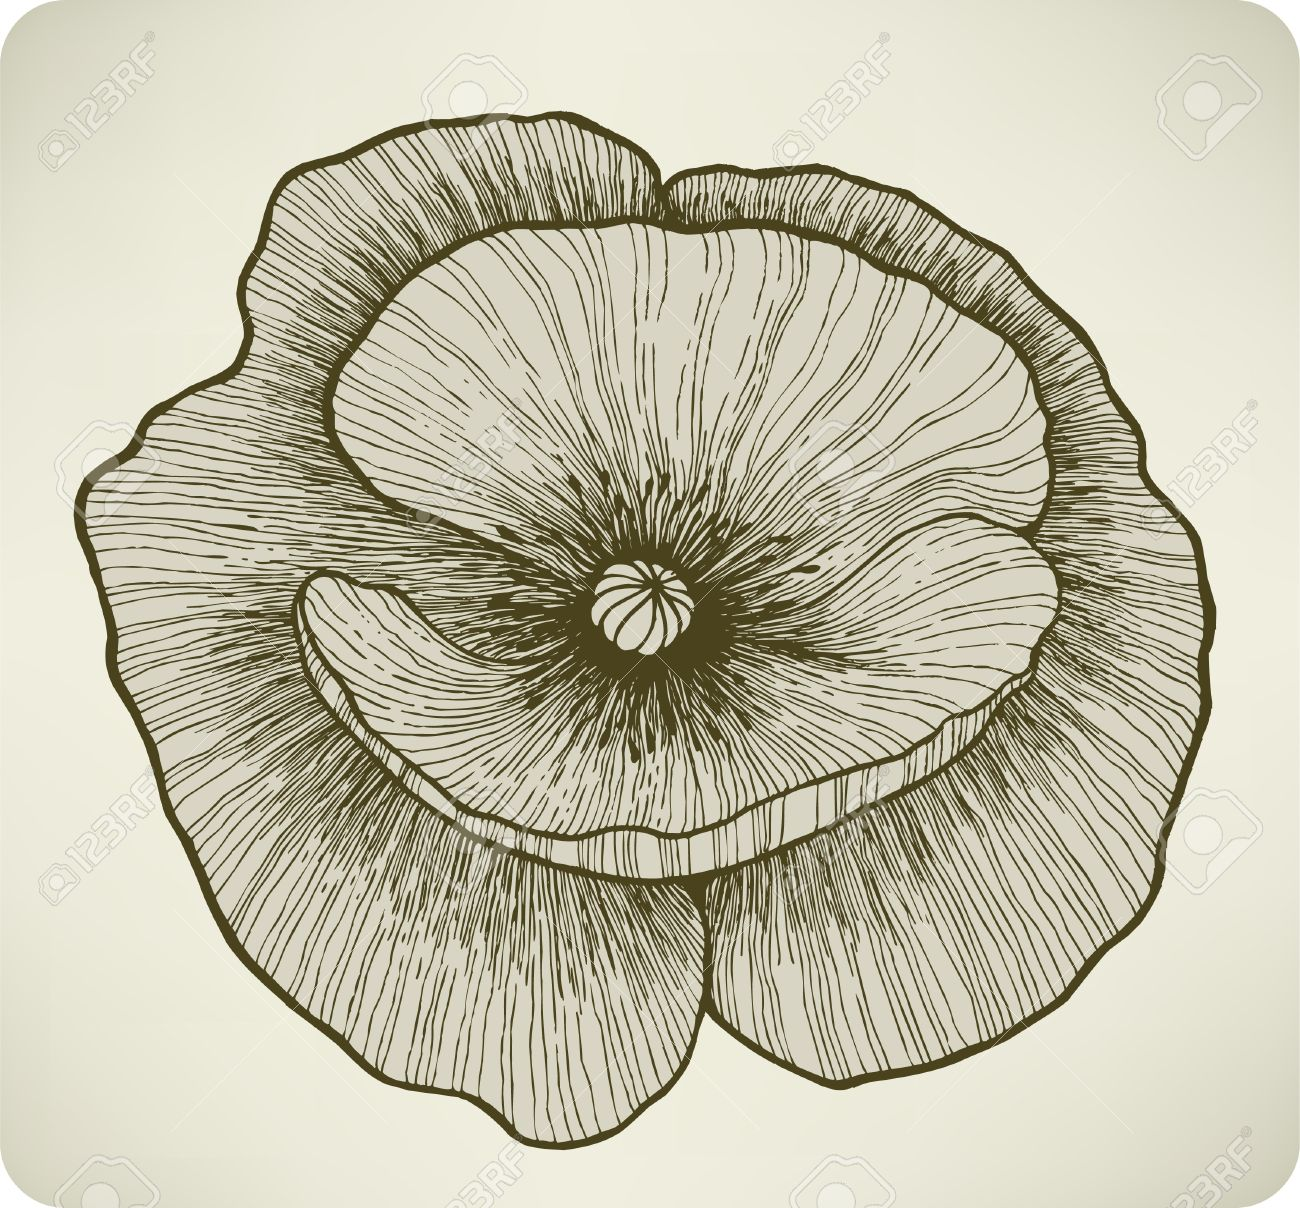 Poppy flower, hand drawing.  illustration. Stock Vector - 17477093